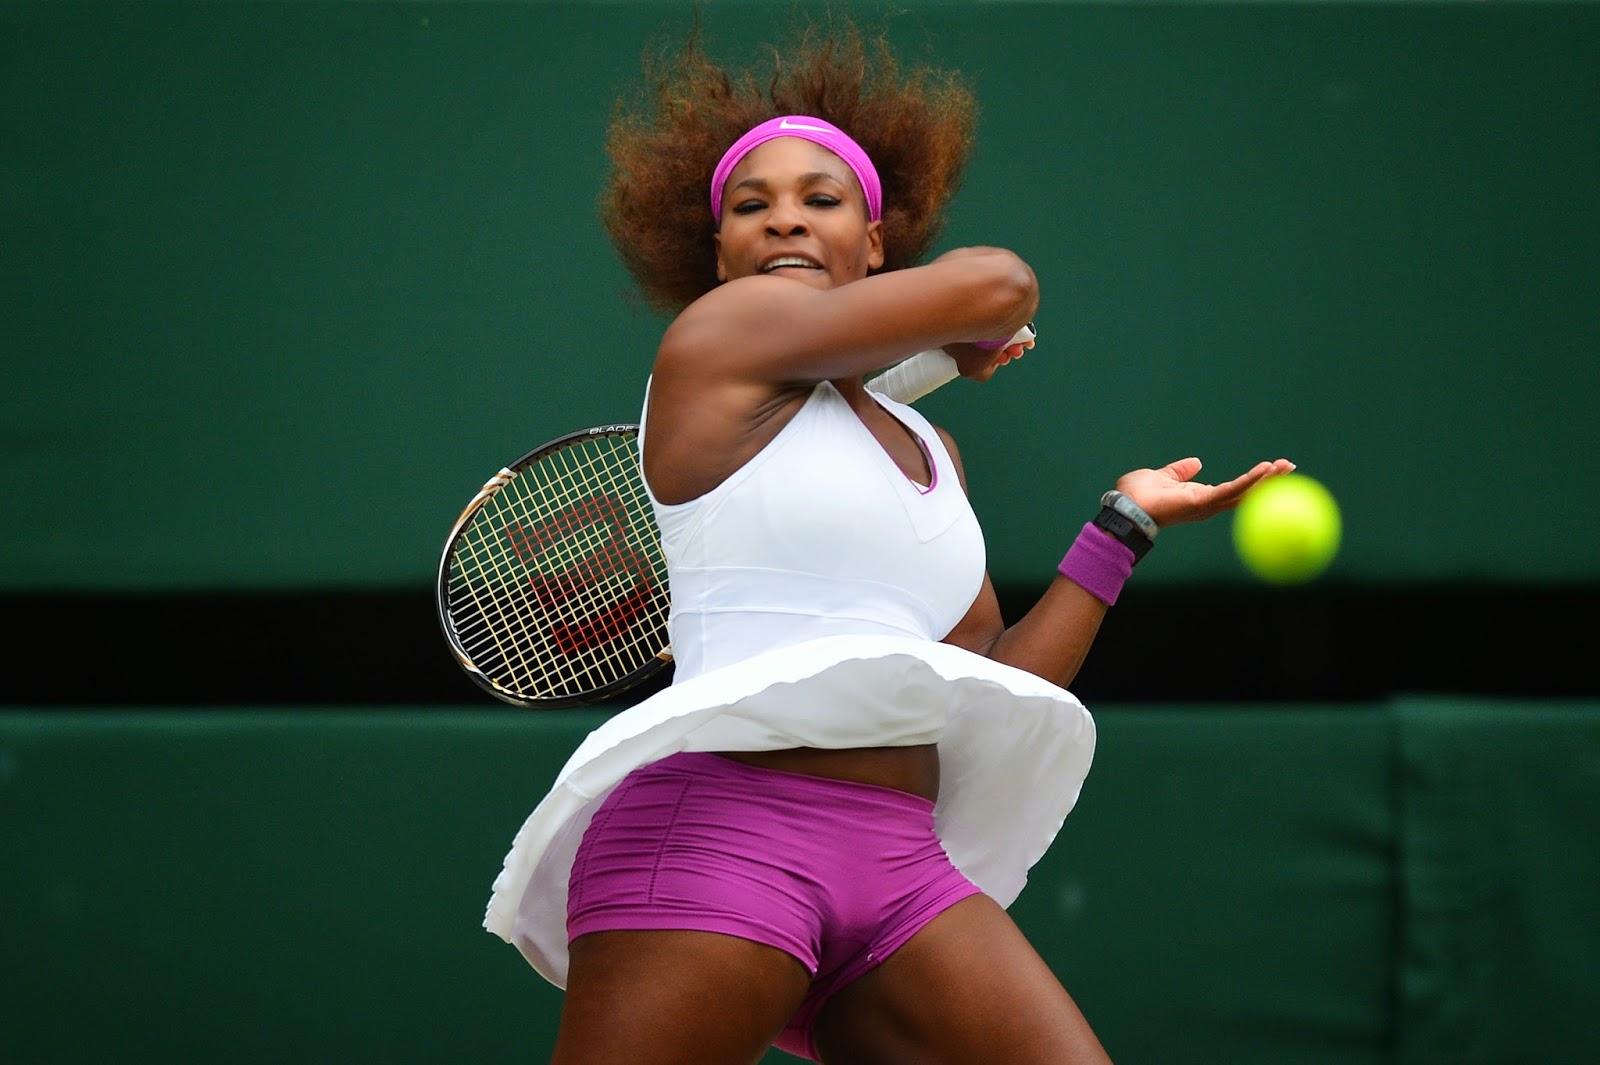 Serena Williams won the Australian Open 2015 beating Maria Sharapova